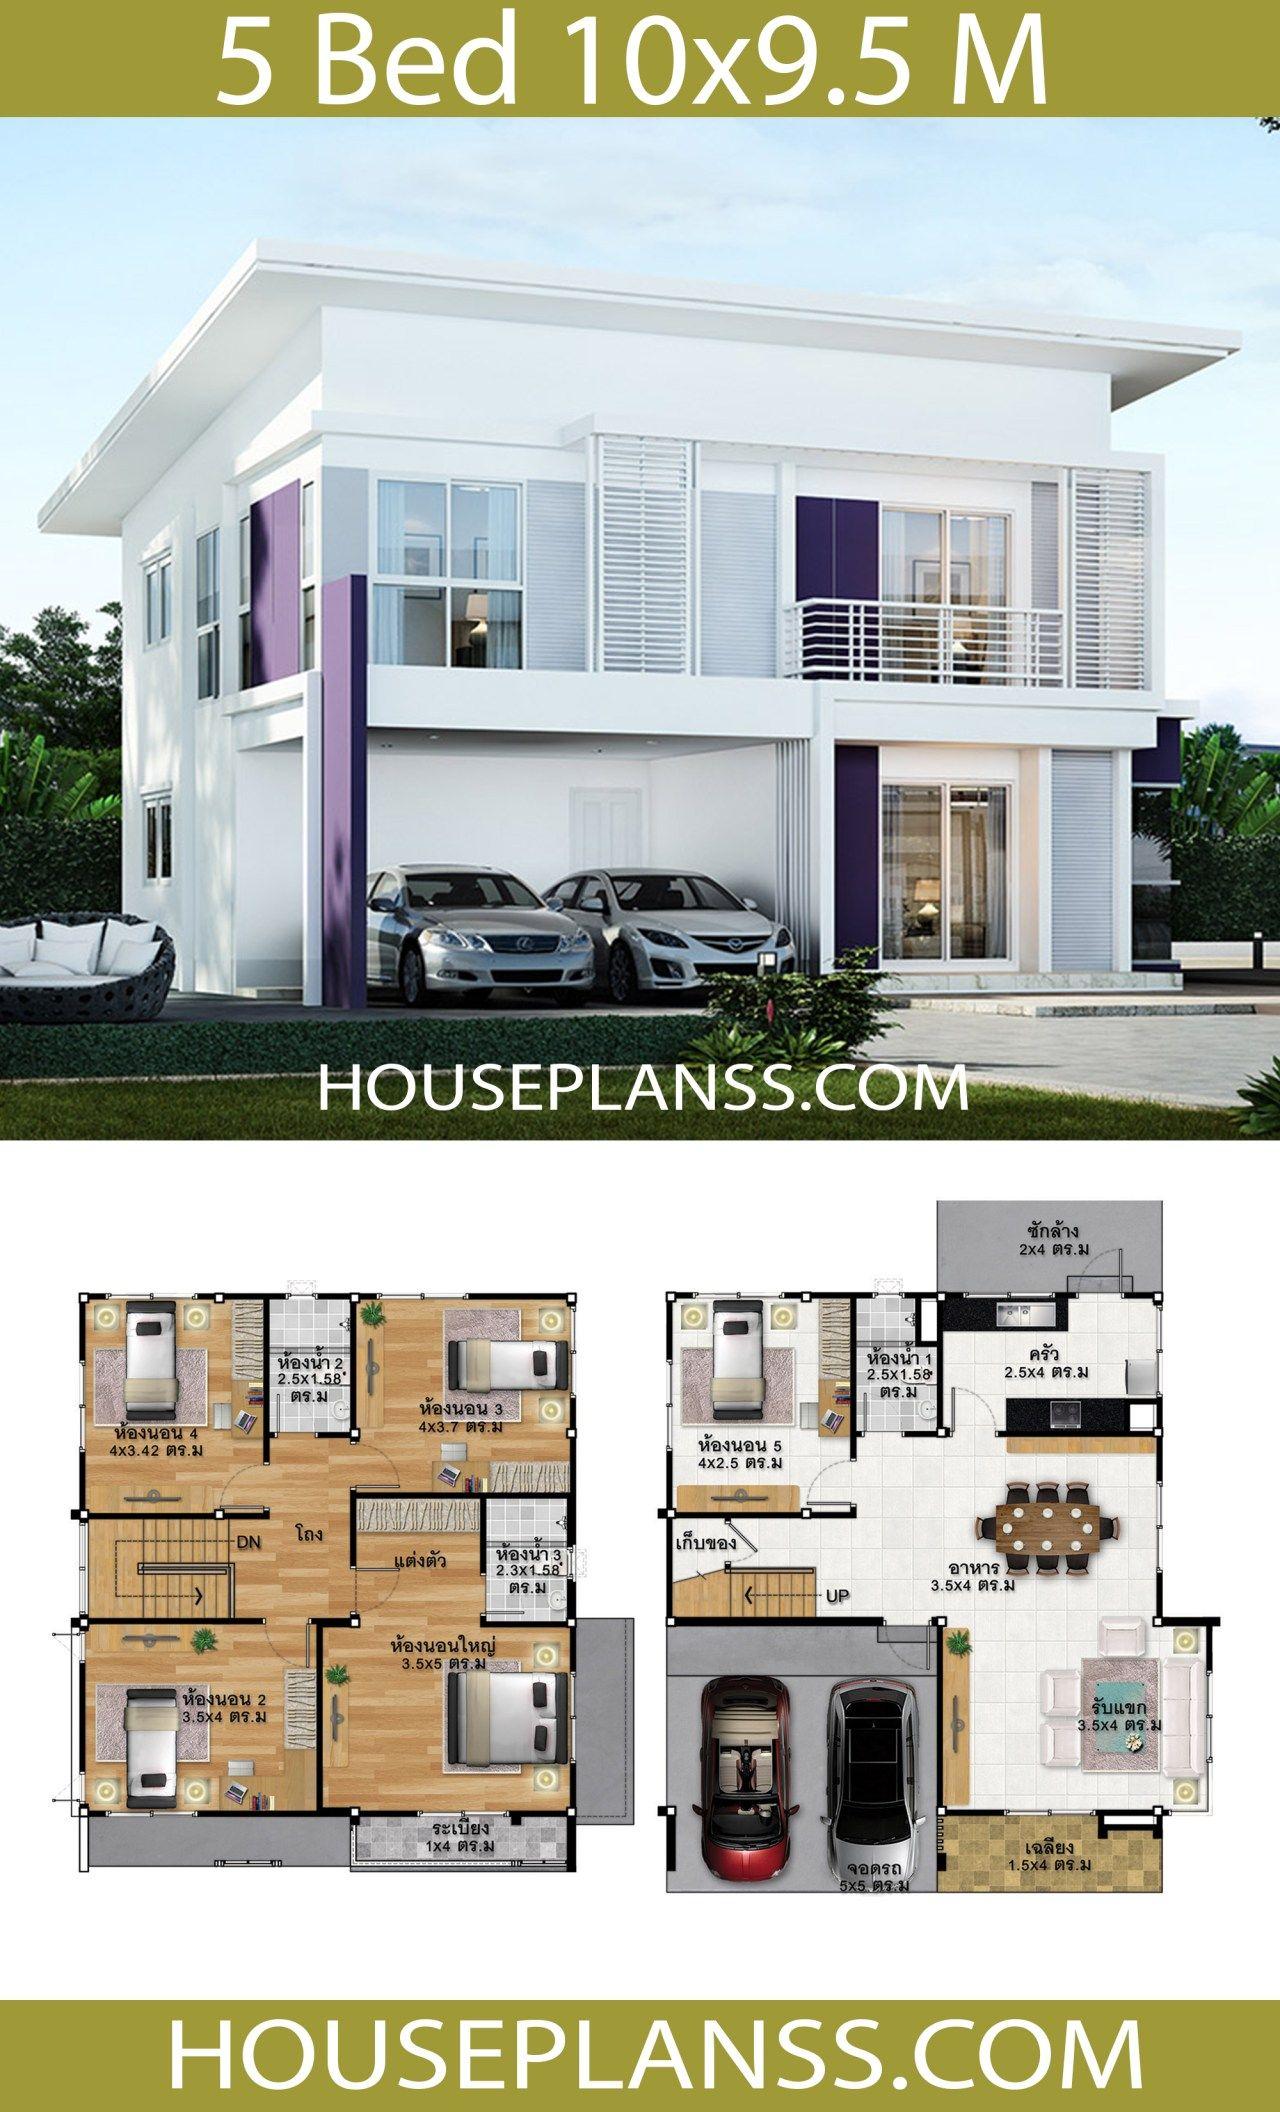 Small House Design Ideas No3 In 2020 Small House Design Tiny House Interior Design Bungalow House Design